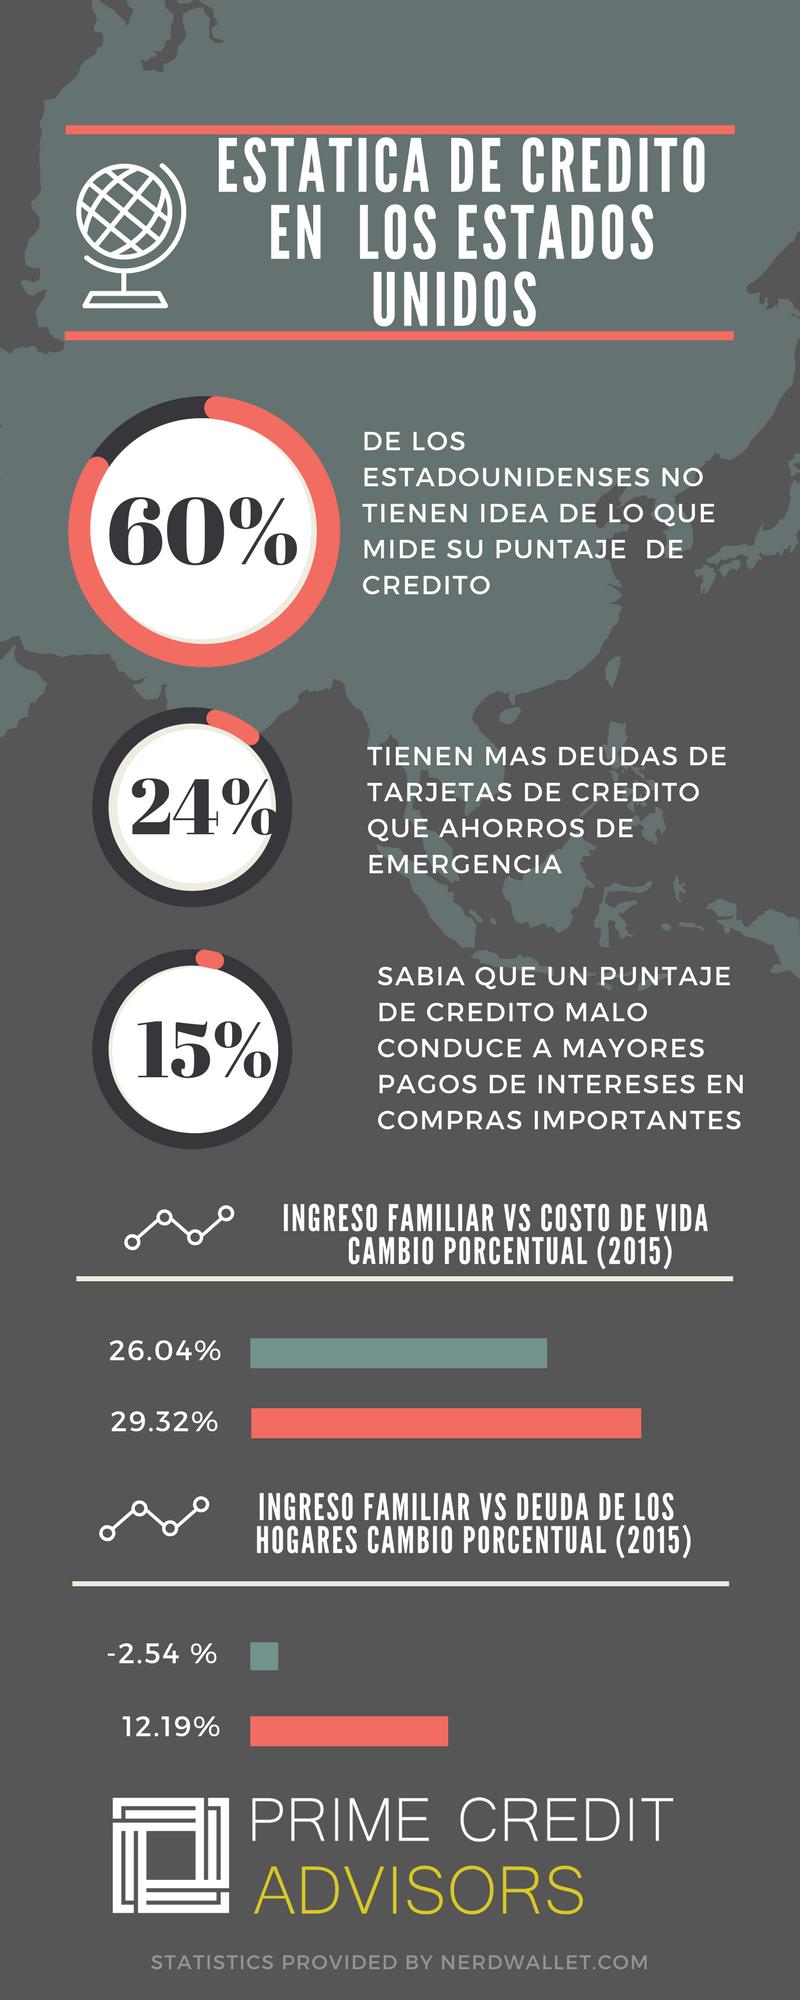 spanish statistics in the US